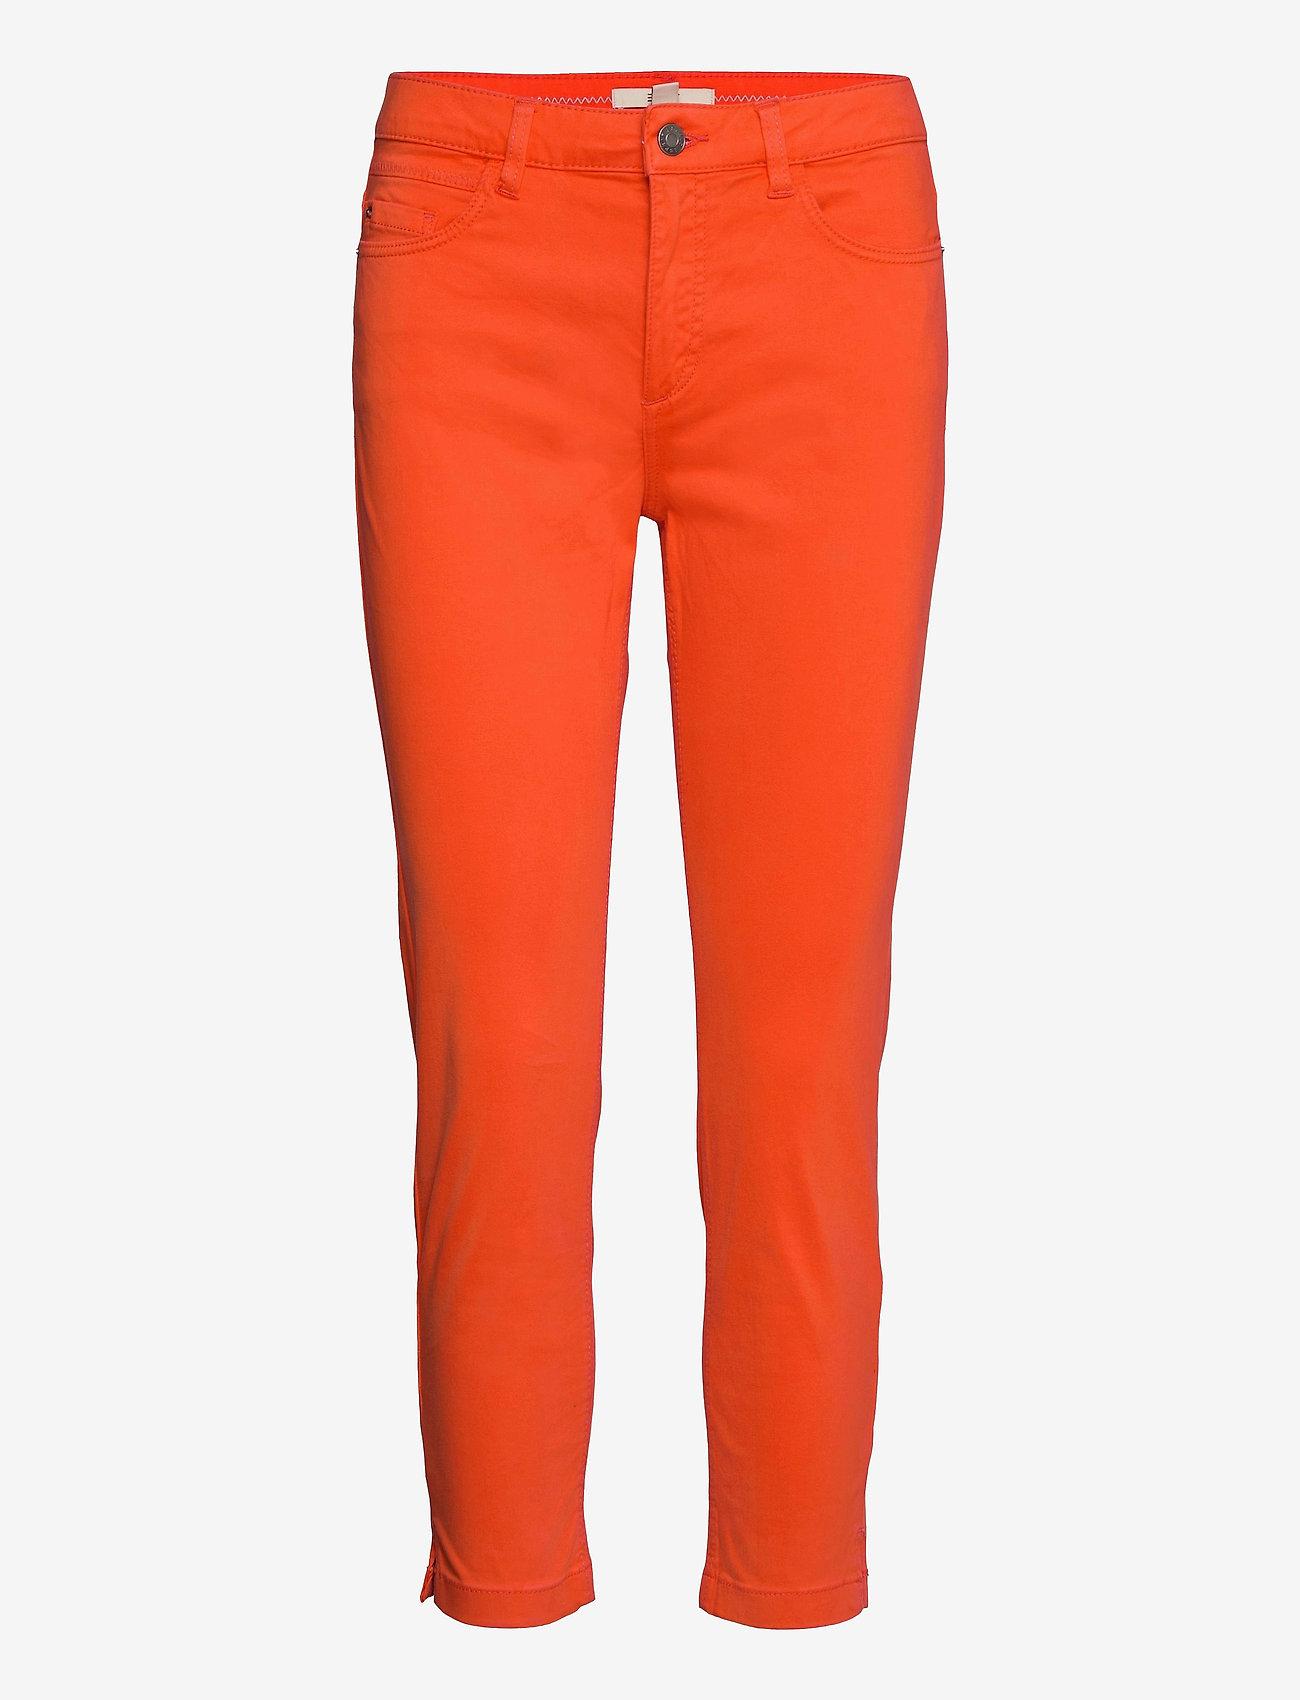 Esprit Casual - Pants woven - slim fit bukser - orange red - 0